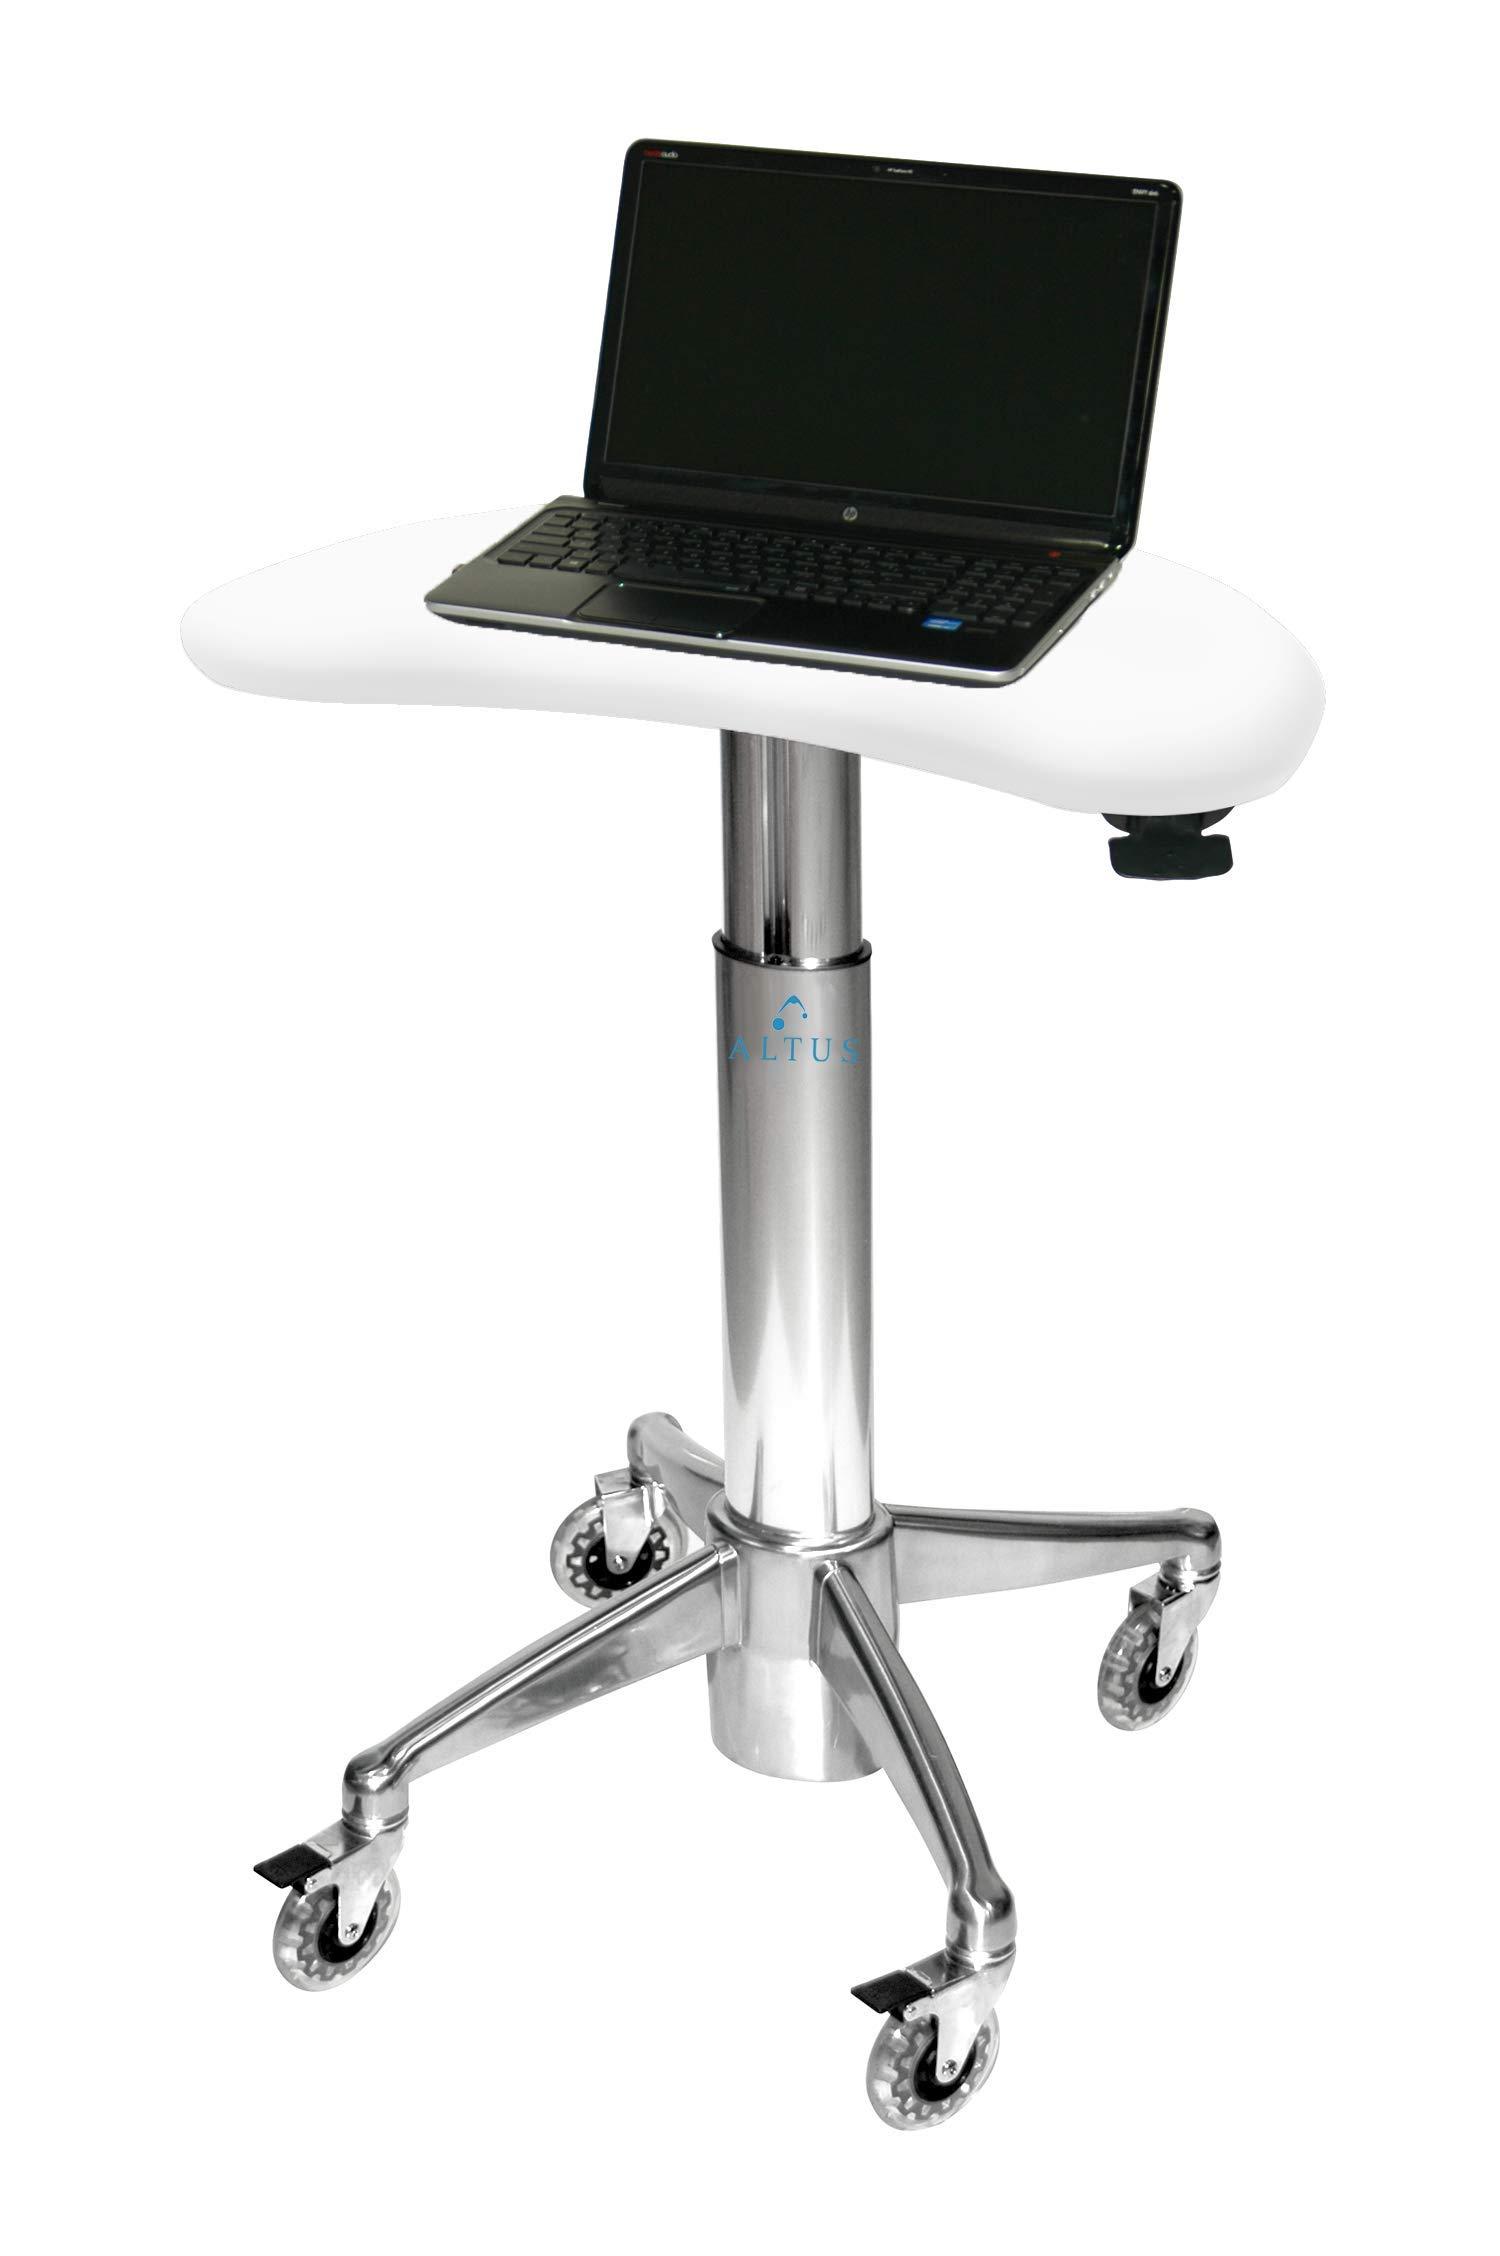 Kidney Laptop Cart, Glacier White by Altus Industries, Inc.